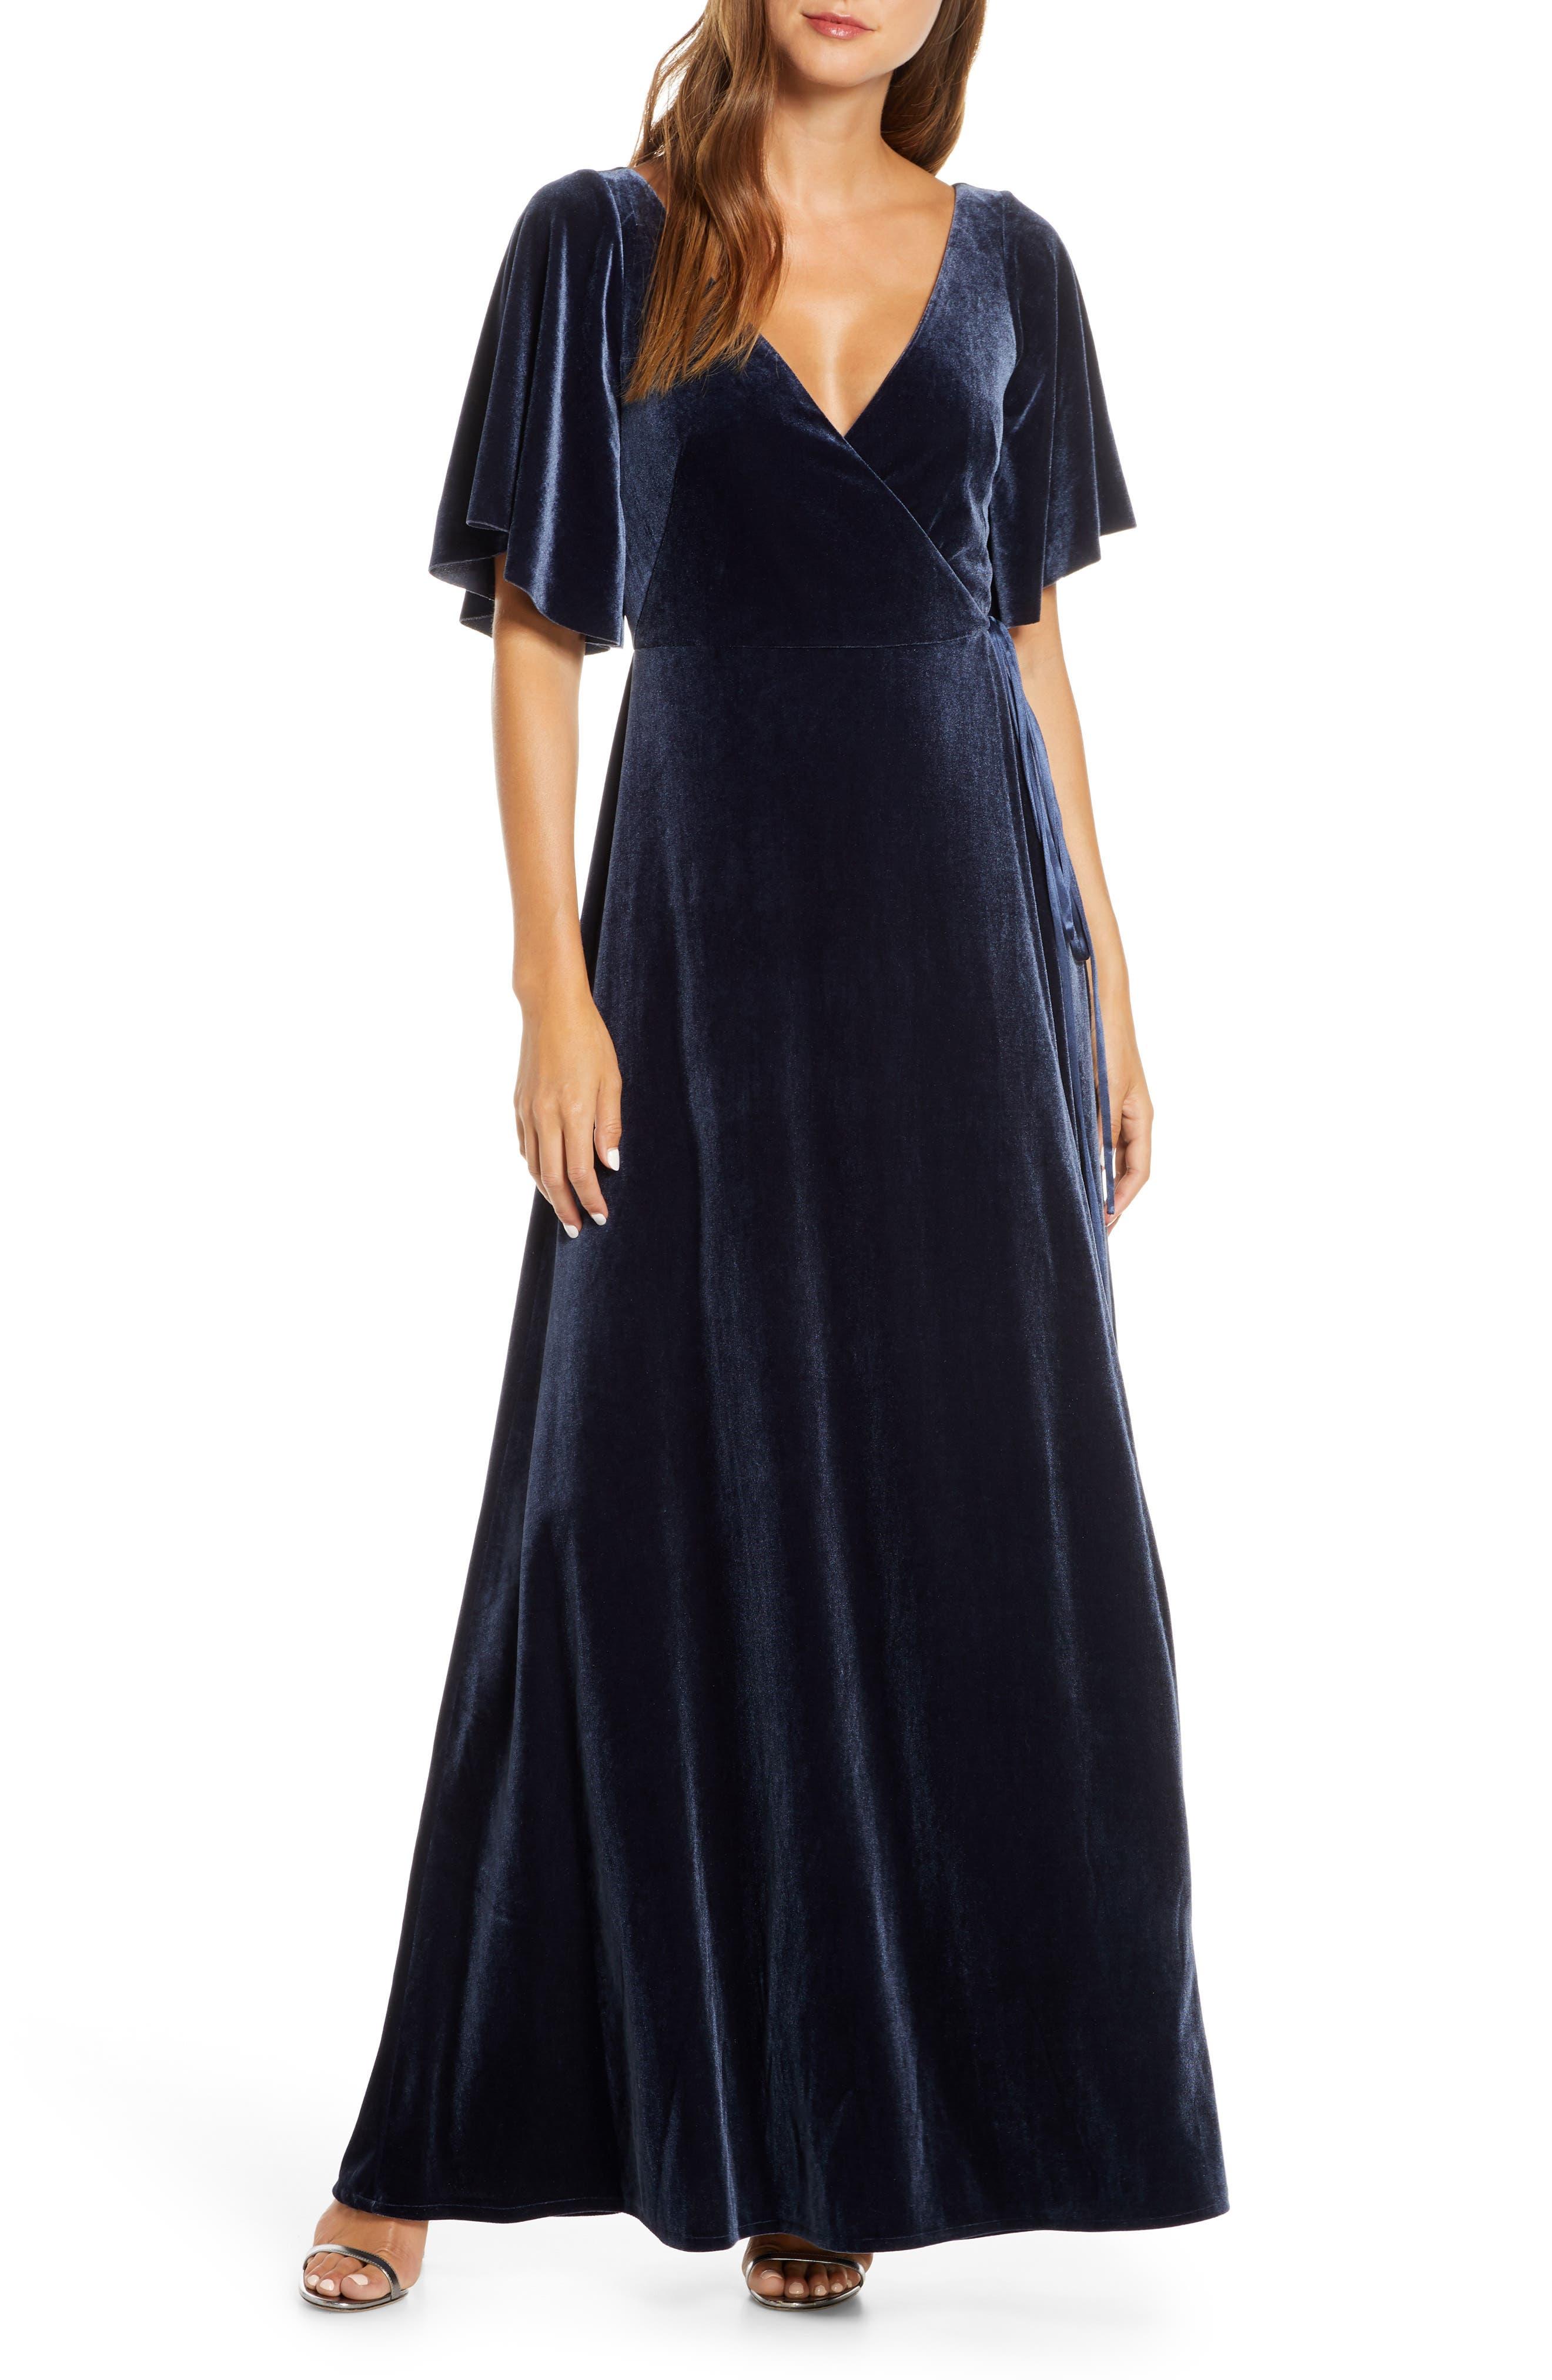 Vintage Evening Dresses and Formal Evening Gowns Womens Jenny Yoo Marin Flutter Sleeve Velvet Faux Wrap Evening Gown $295.00 AT vintagedancer.com